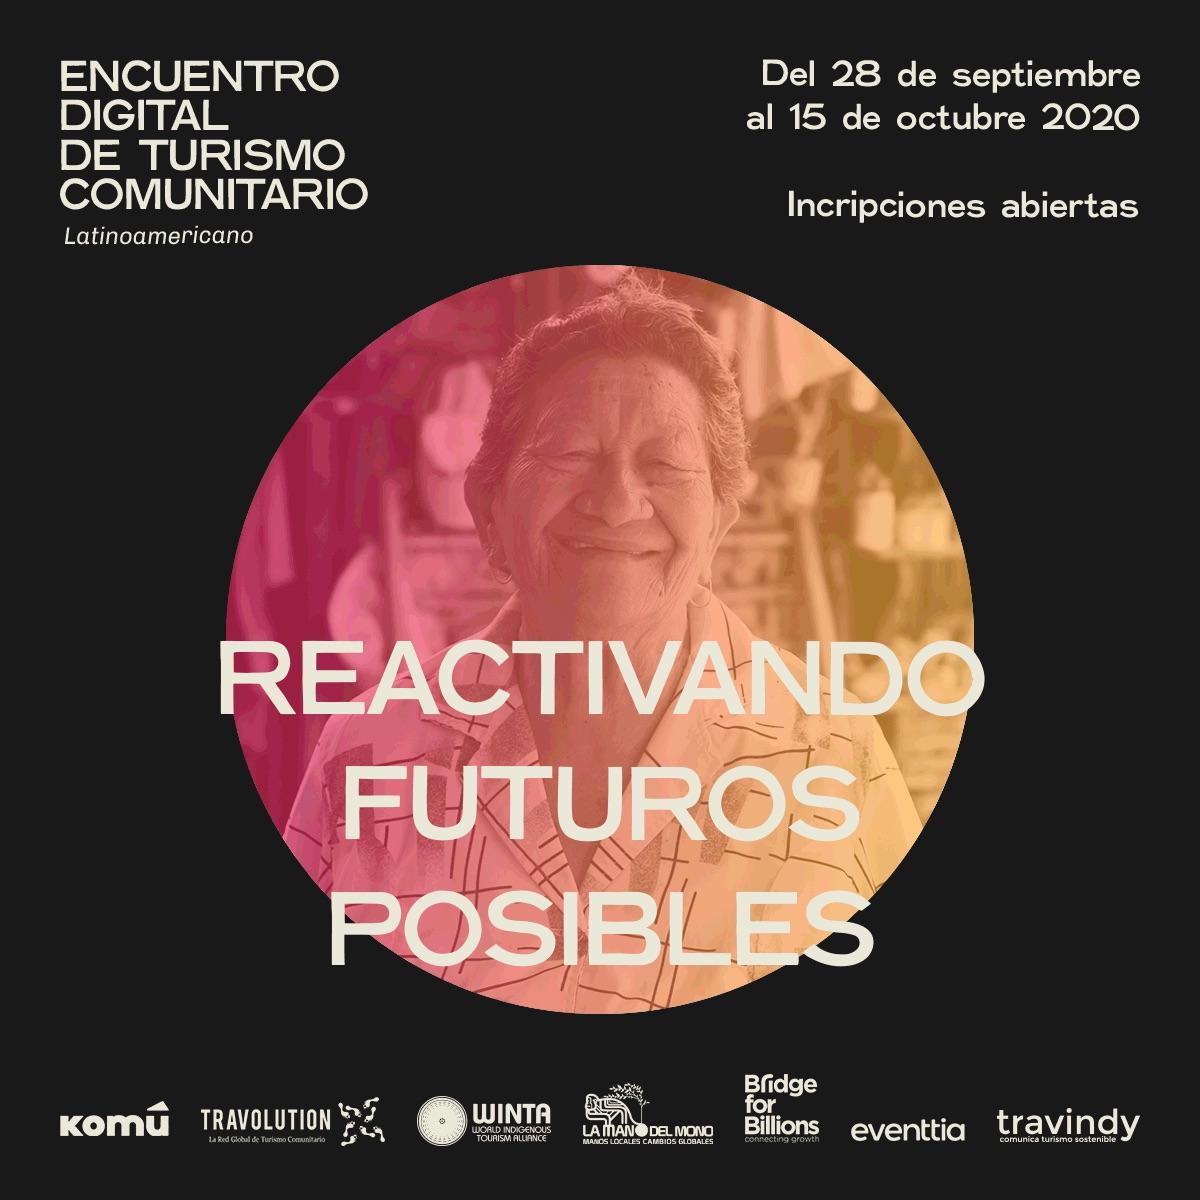 Encuentro digital de turismo comunitario Latinoamericano